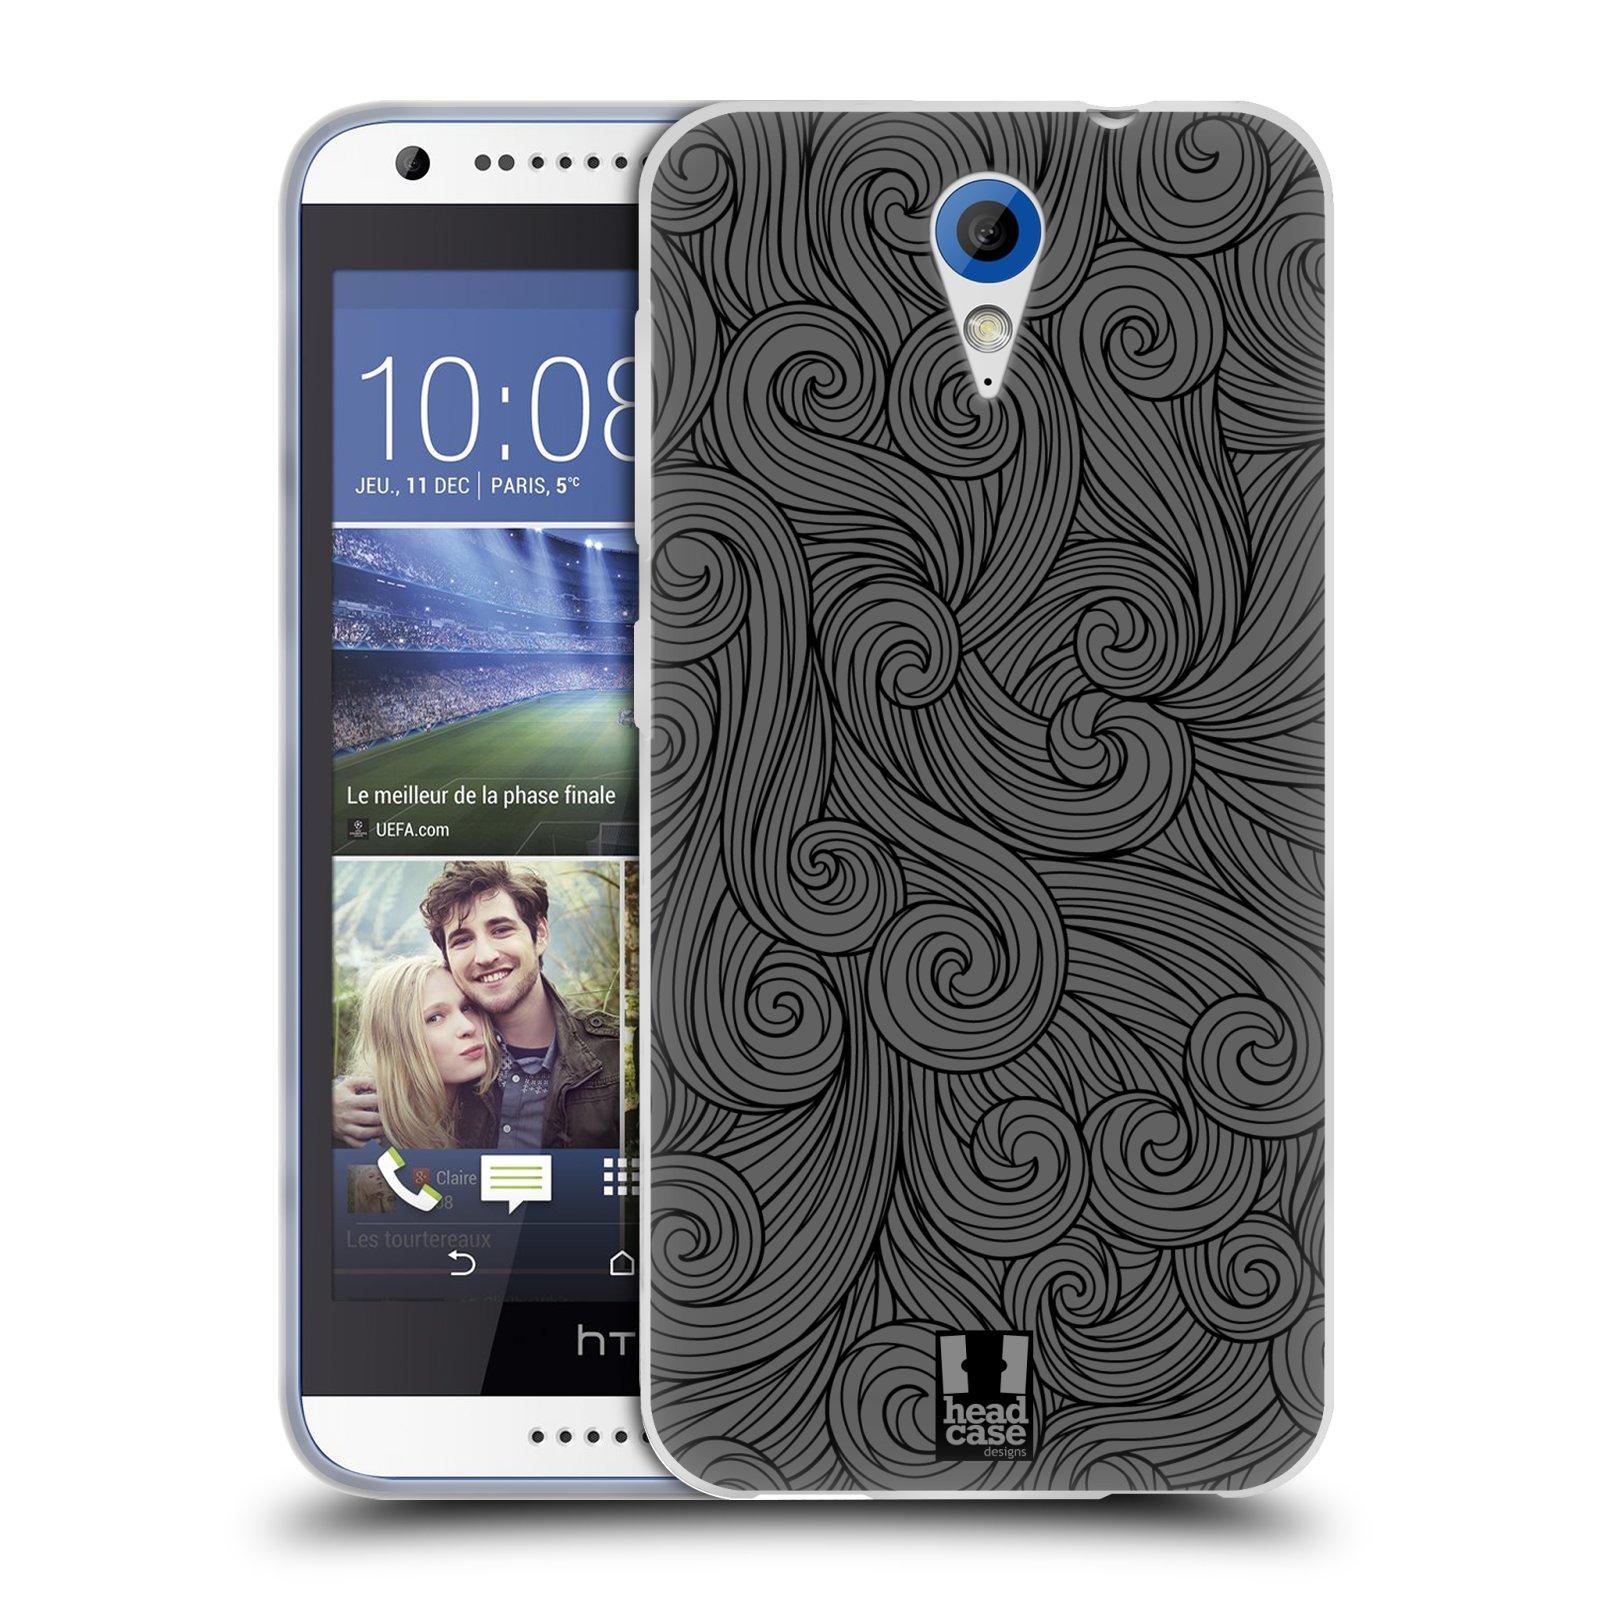 Silikonové pouzdro na mobil HTC Desire 620 HEAD CASE Dark Grey Swirls (Silikonový kryt či obal na mobilní telefon HTC Desire 620)